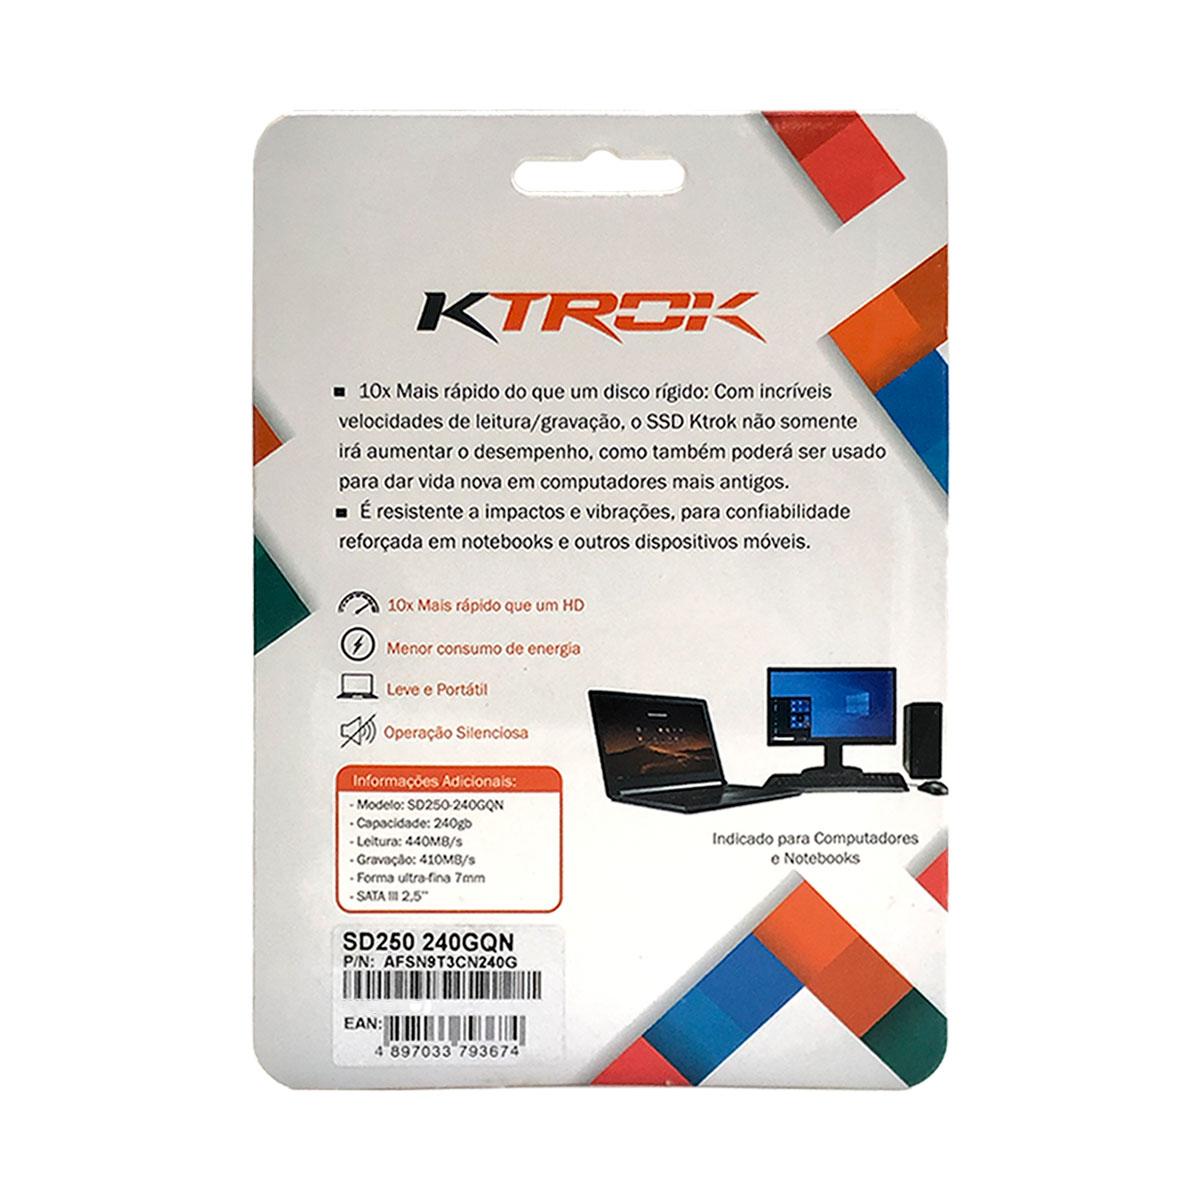 "HD SSD 240GB KTROK SD250-240GQN, Leitura 440MB/s, Gravação 410 MB/s, 7mm, Sata III 2,5"""